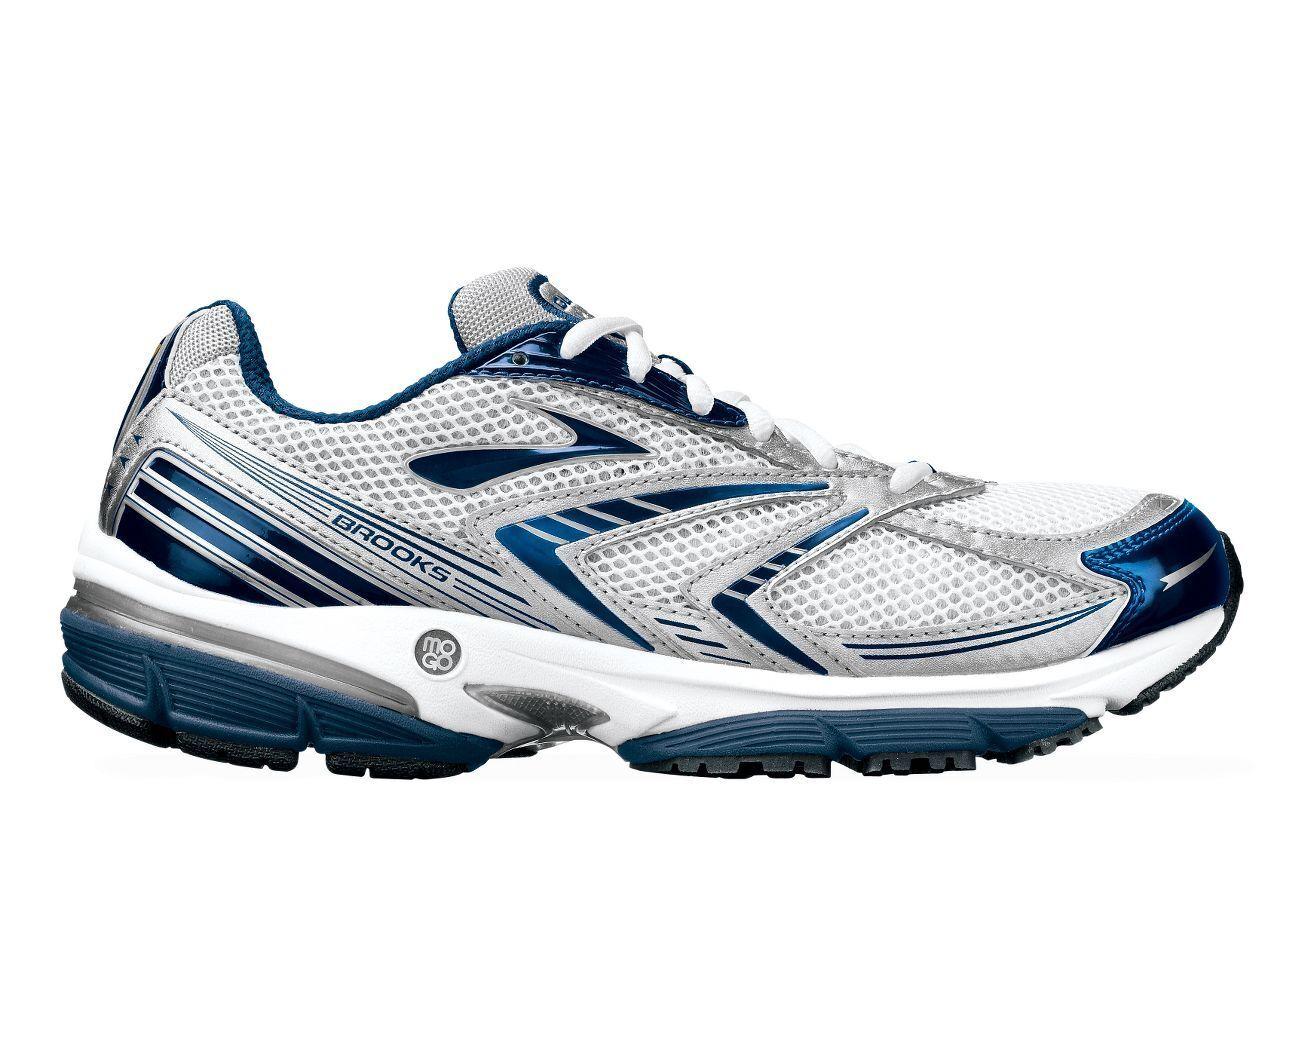 Brooks Glycerin 7 Mens Running scarpe (D) (143)   SAVE